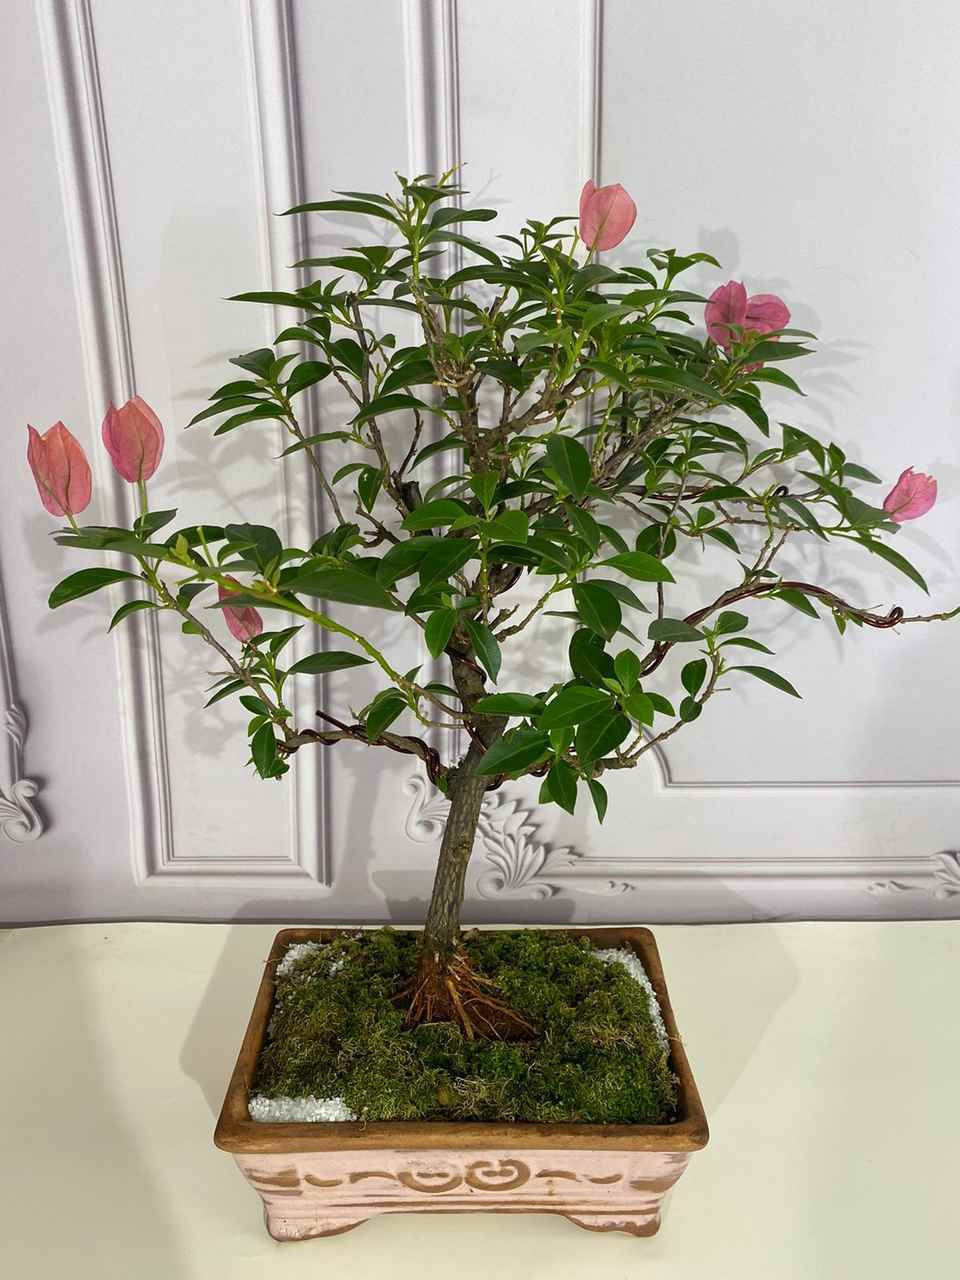 Bonsai colecionador 6 anos - Bougainvillea